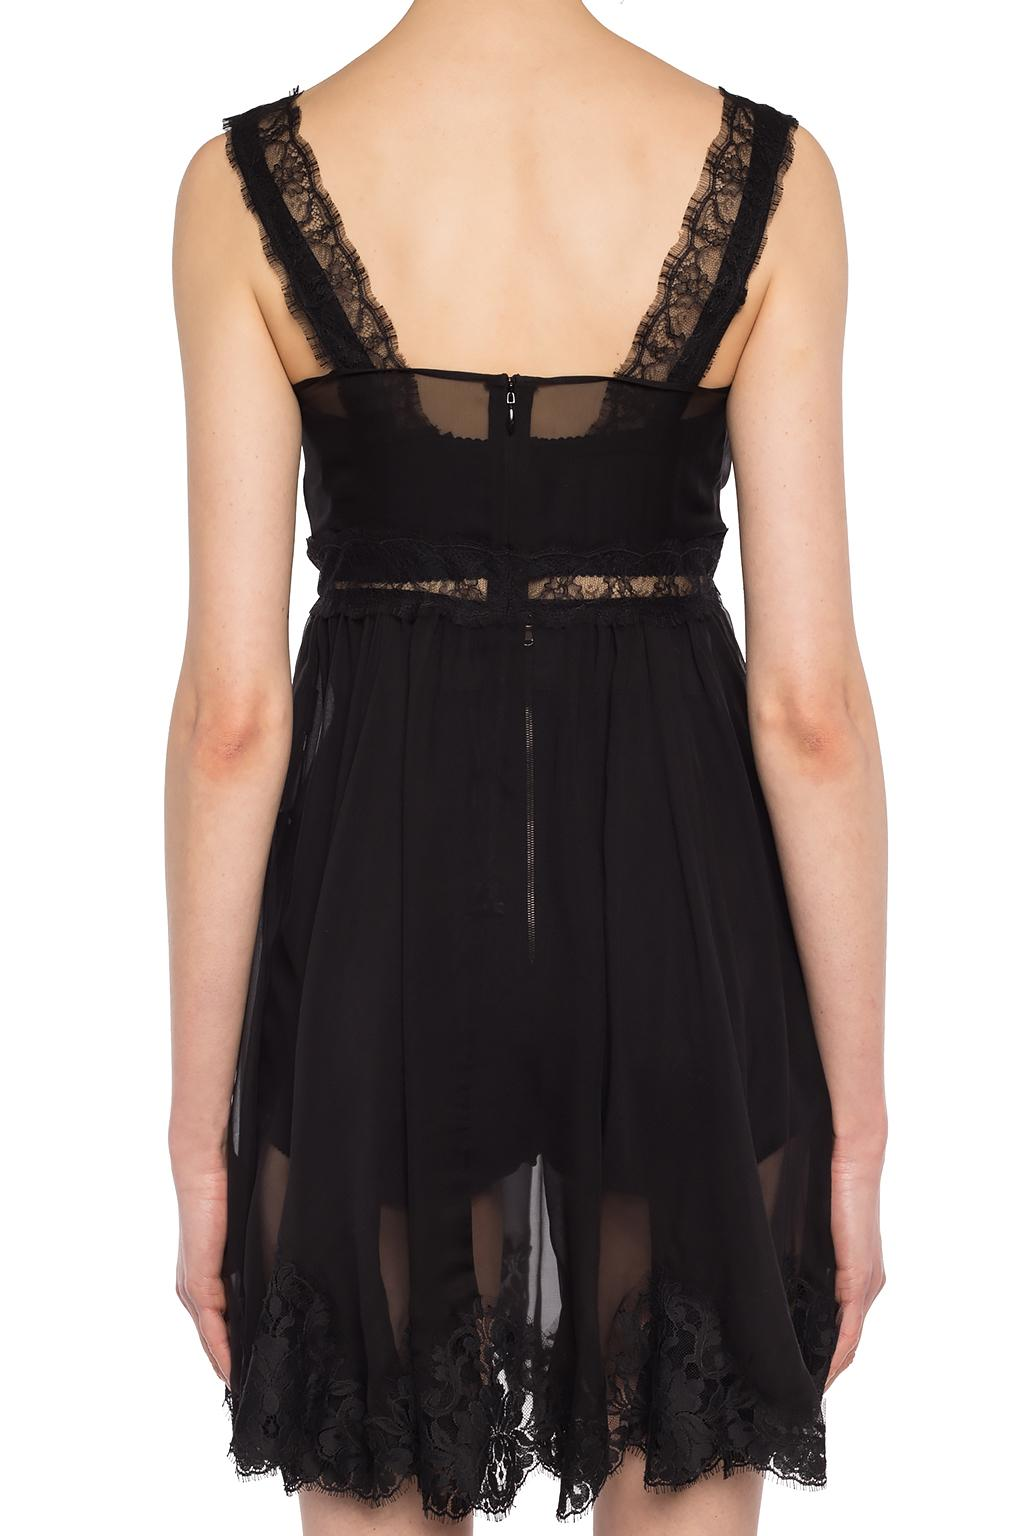 Dolce & Gabbana Ruffled see-through dress